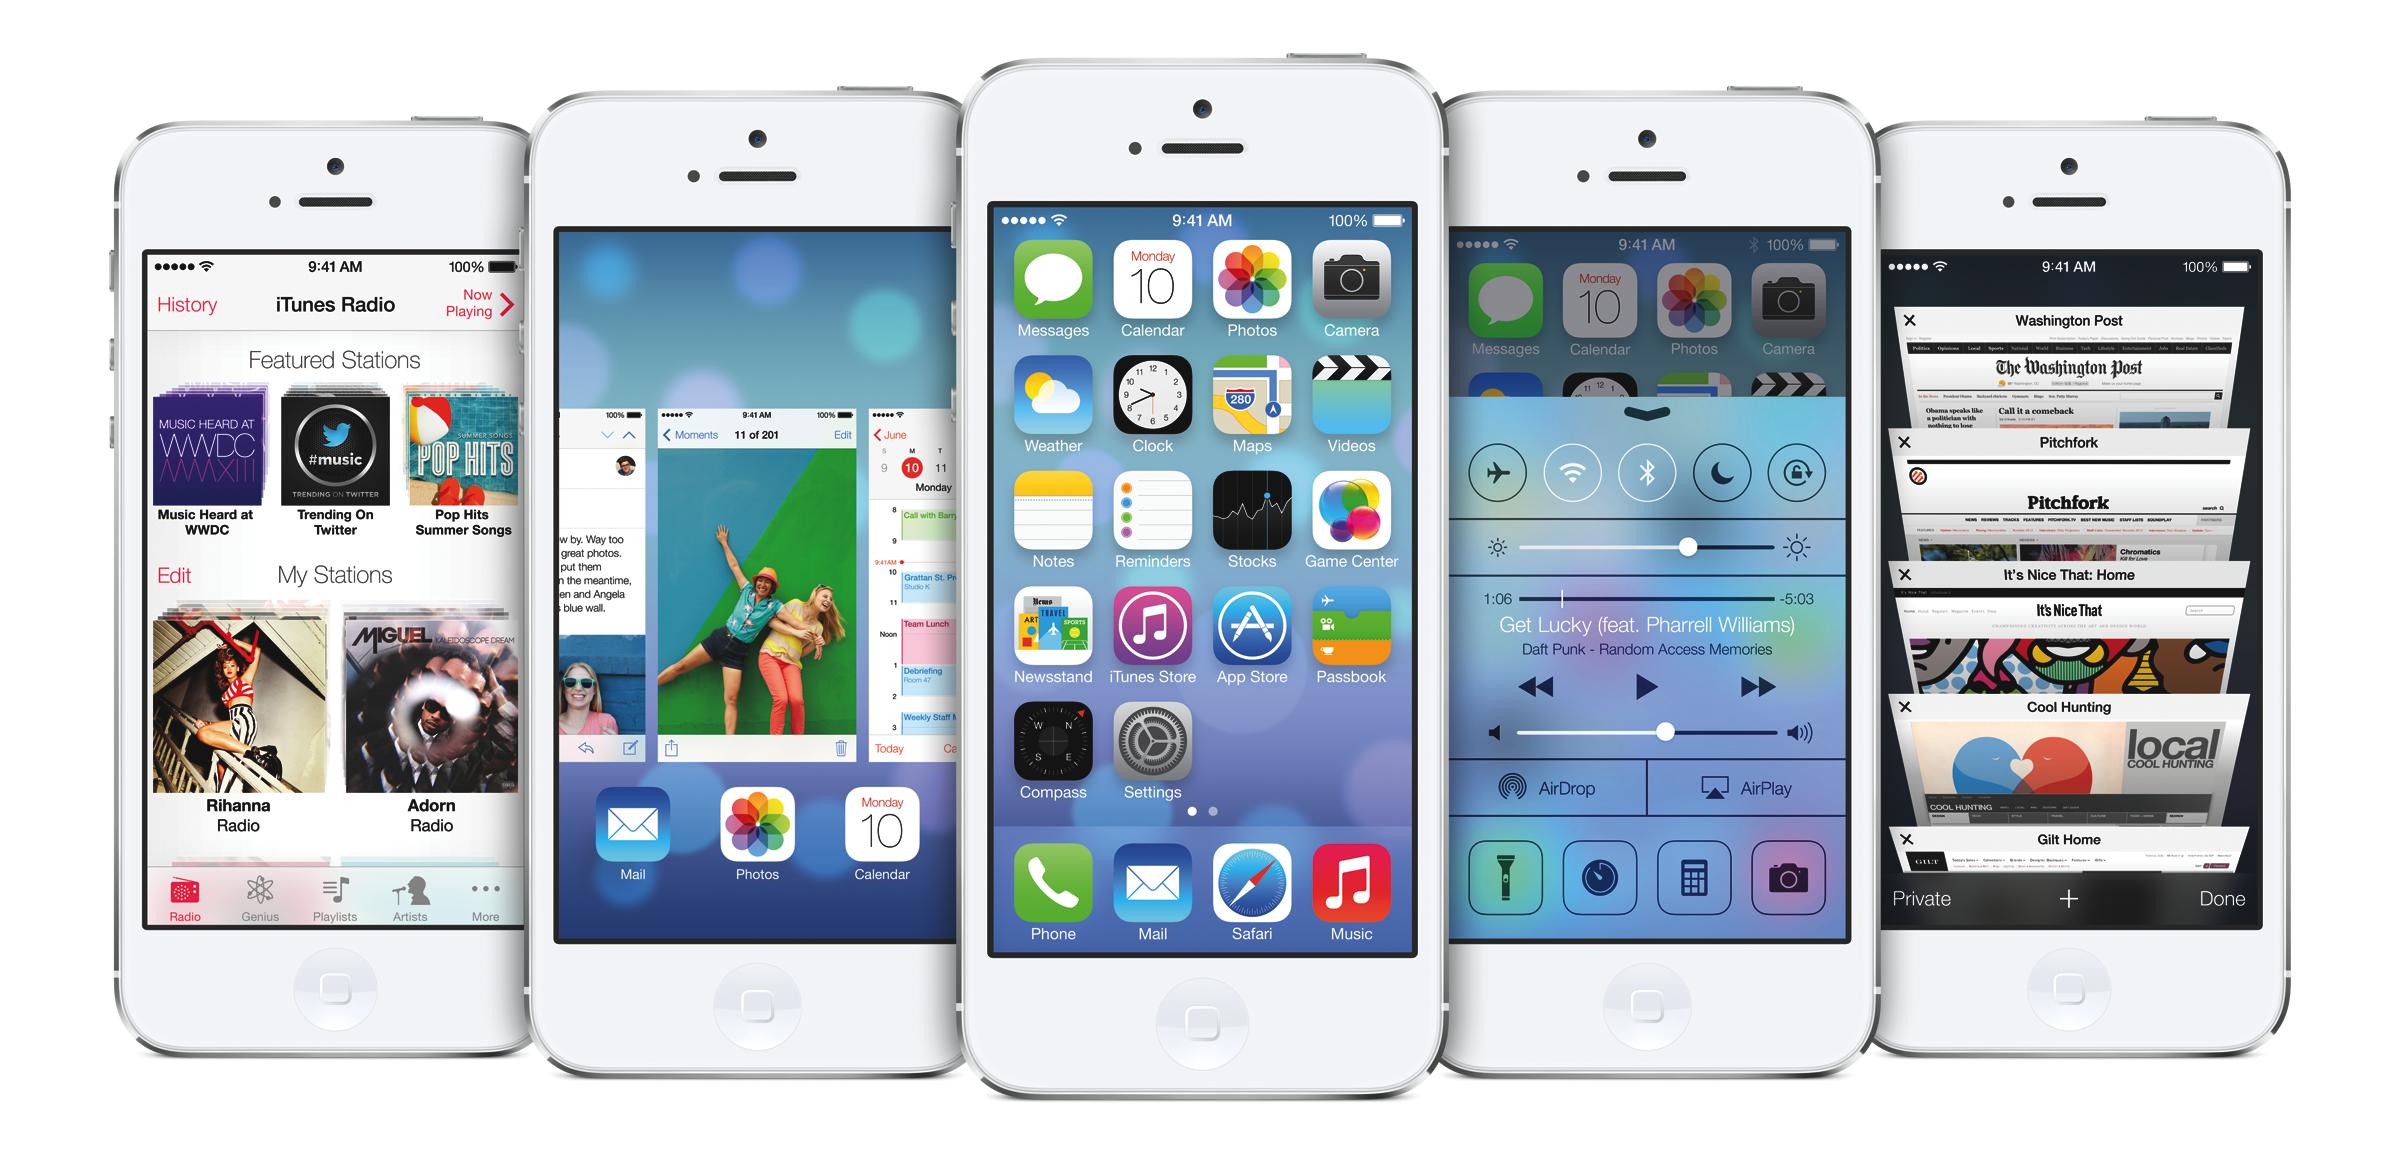 iOS 7 additions